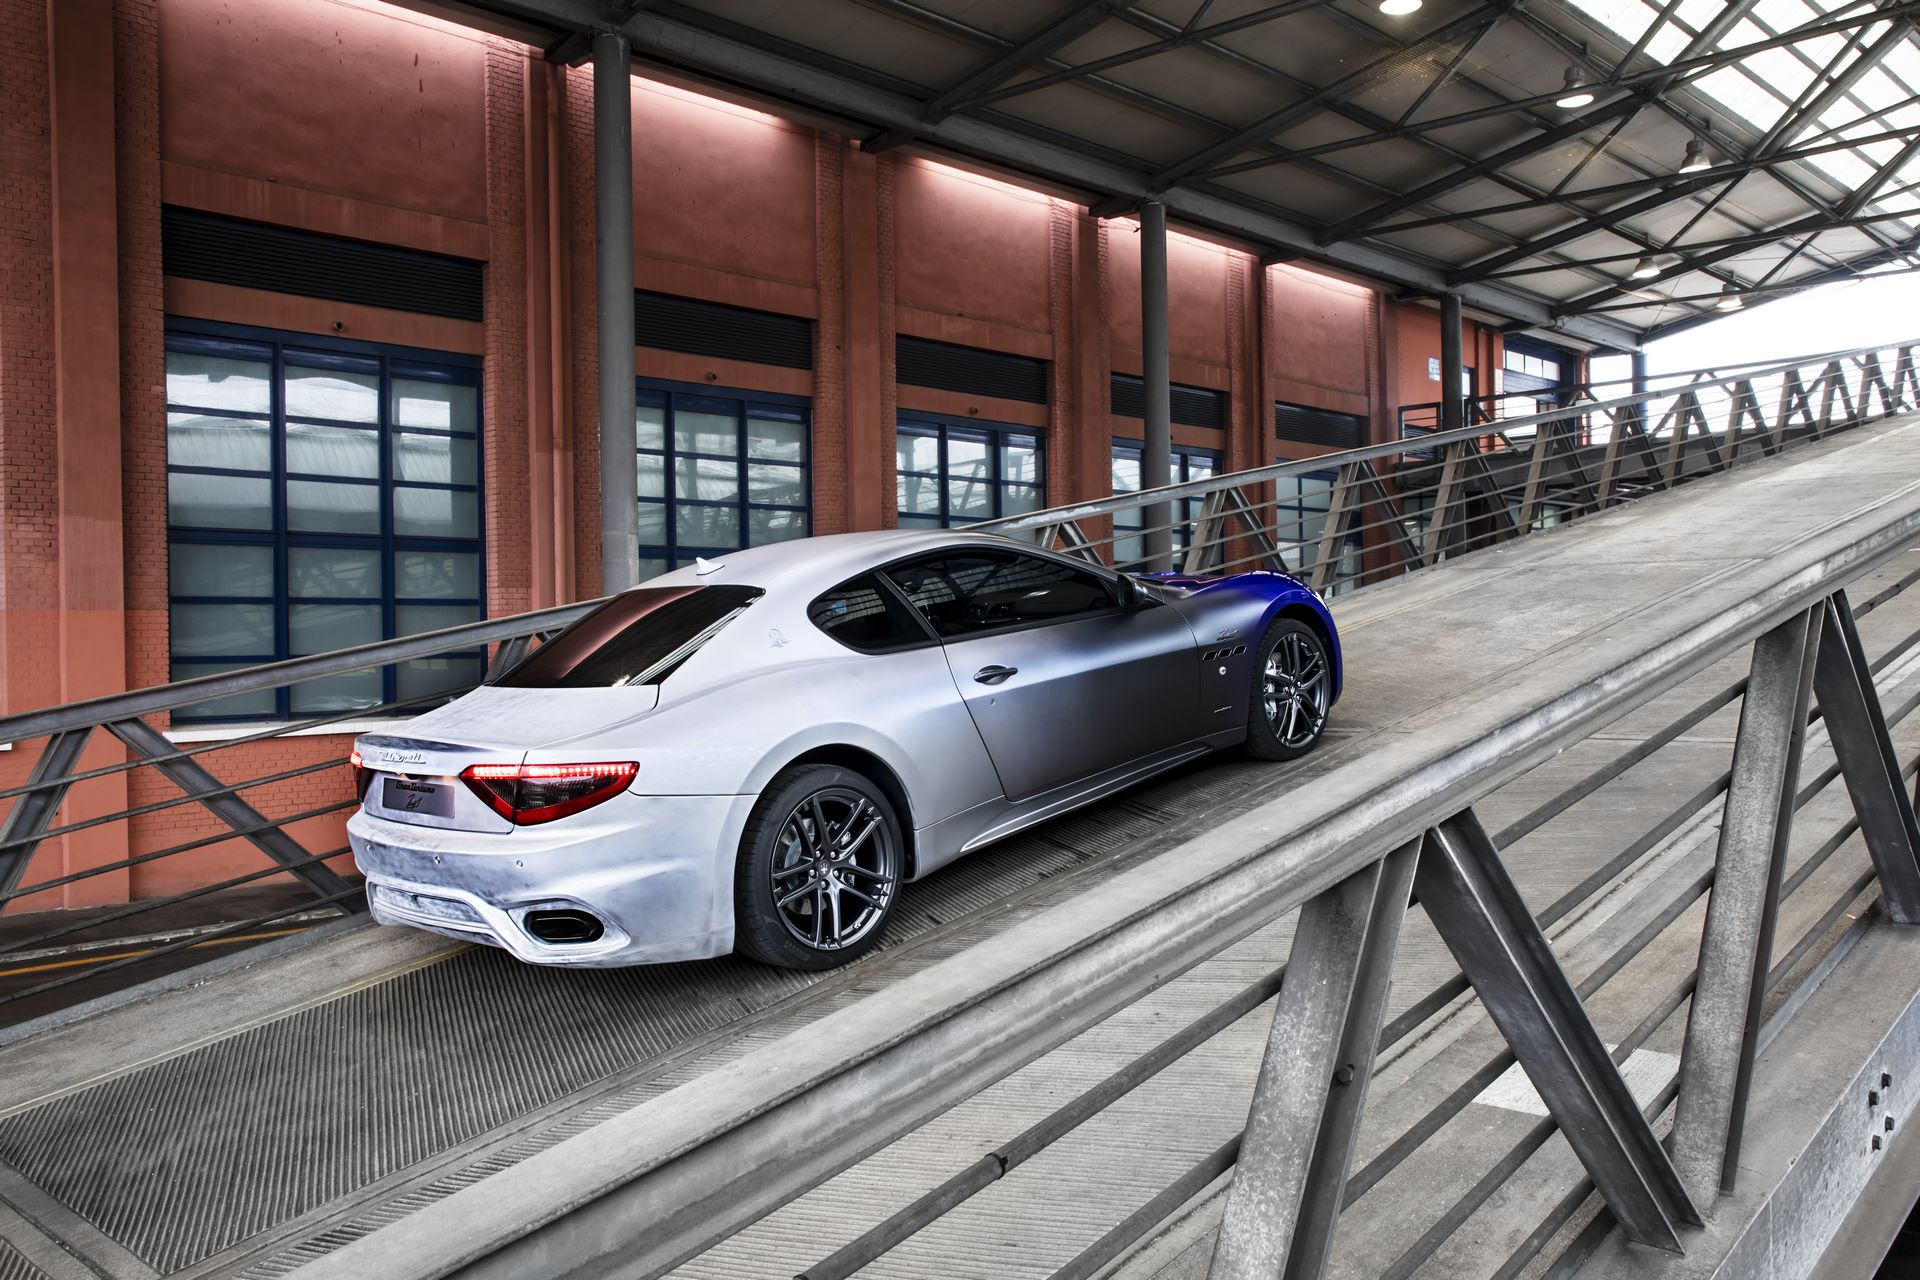 Maserati-GranTurismo-Zeda-2